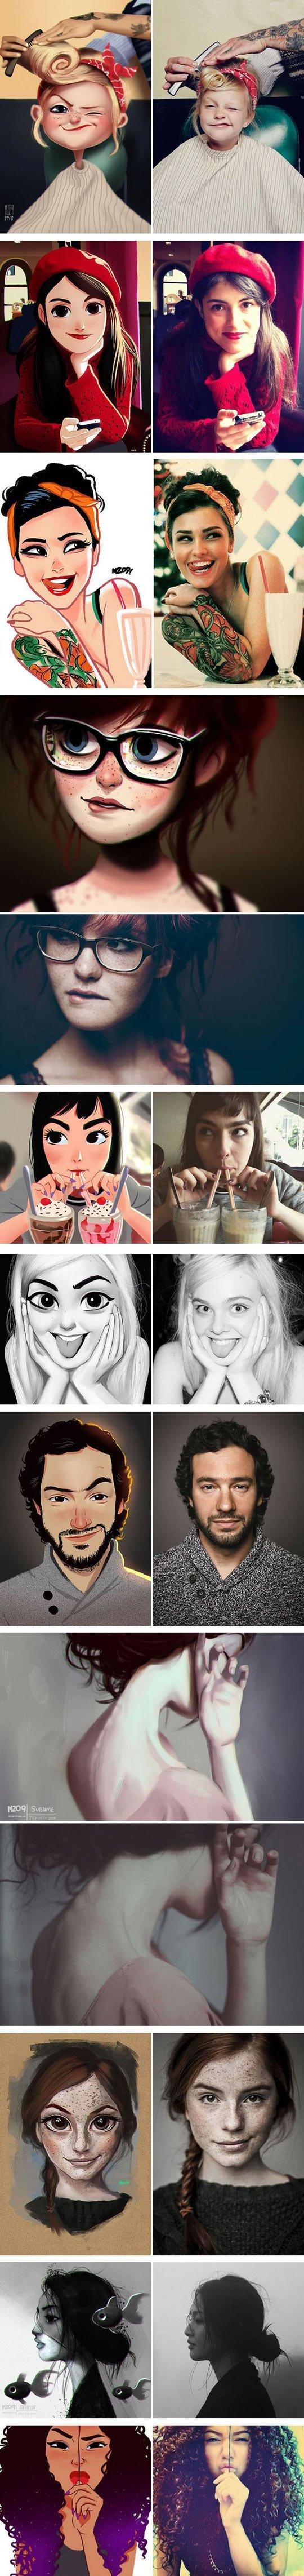 Artist Turns Photos Of Random People Into Fun Illustrations